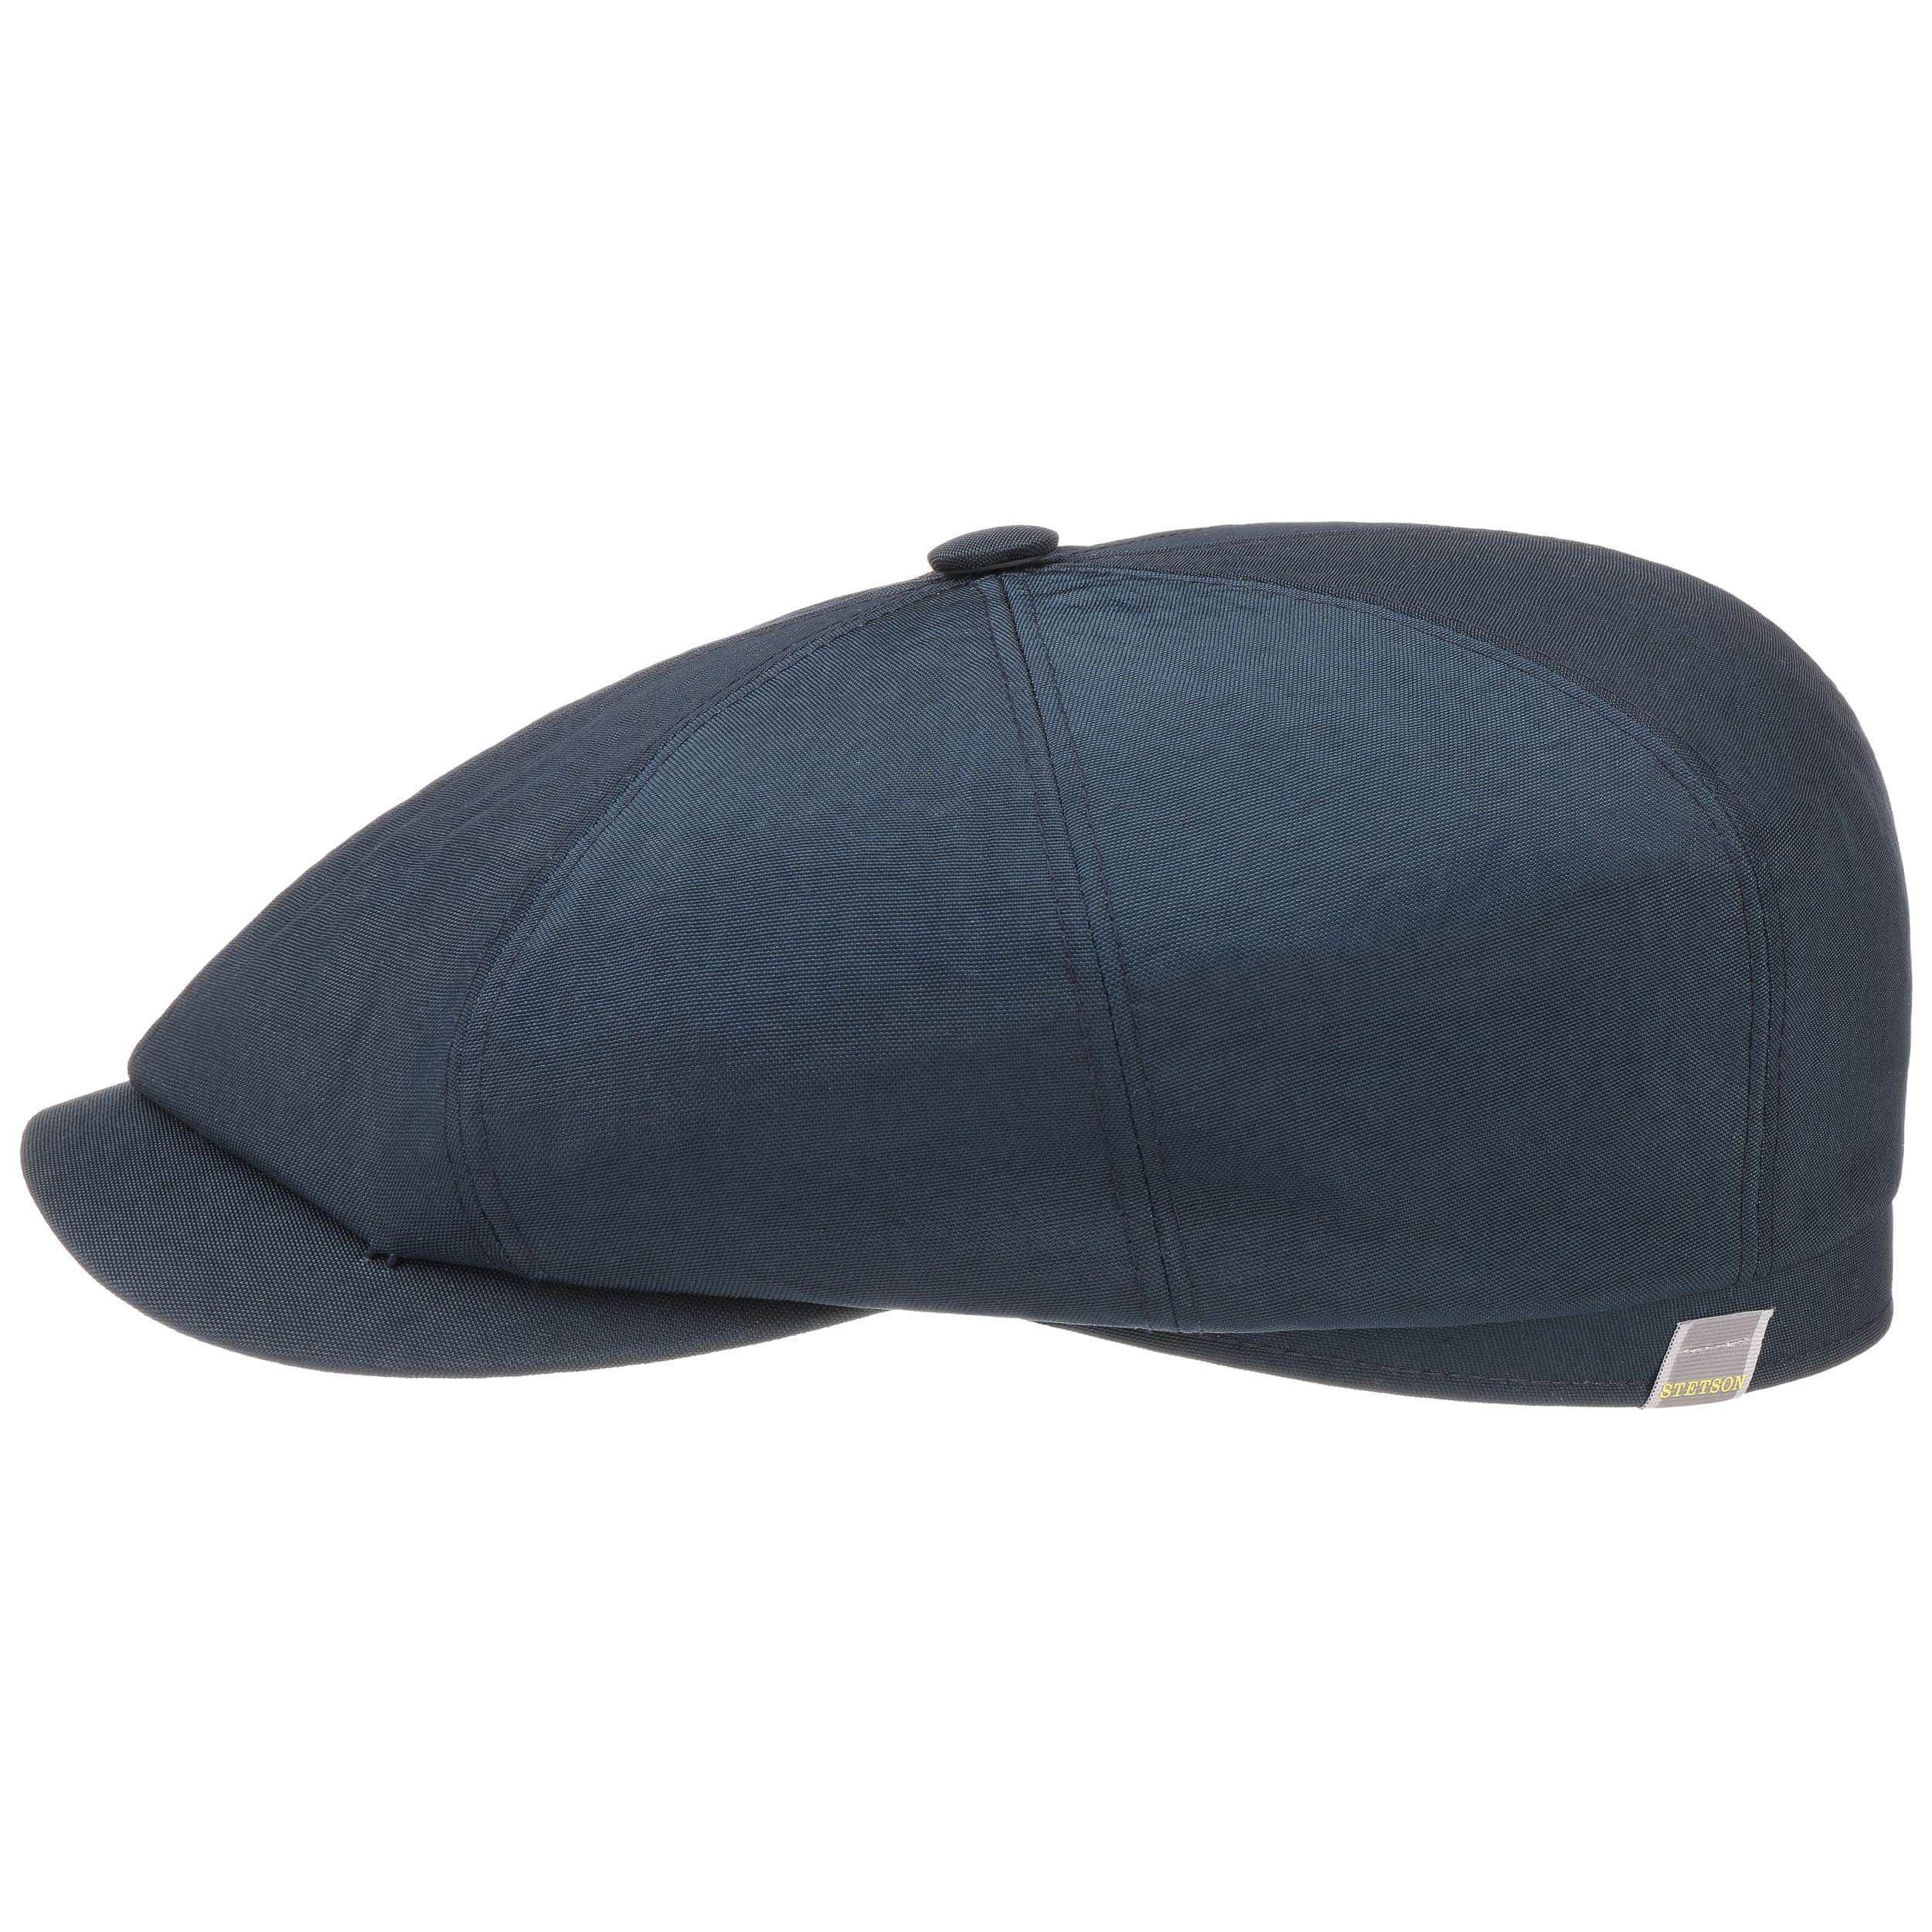 Hatteras PCM Nylon Flat Cap blue